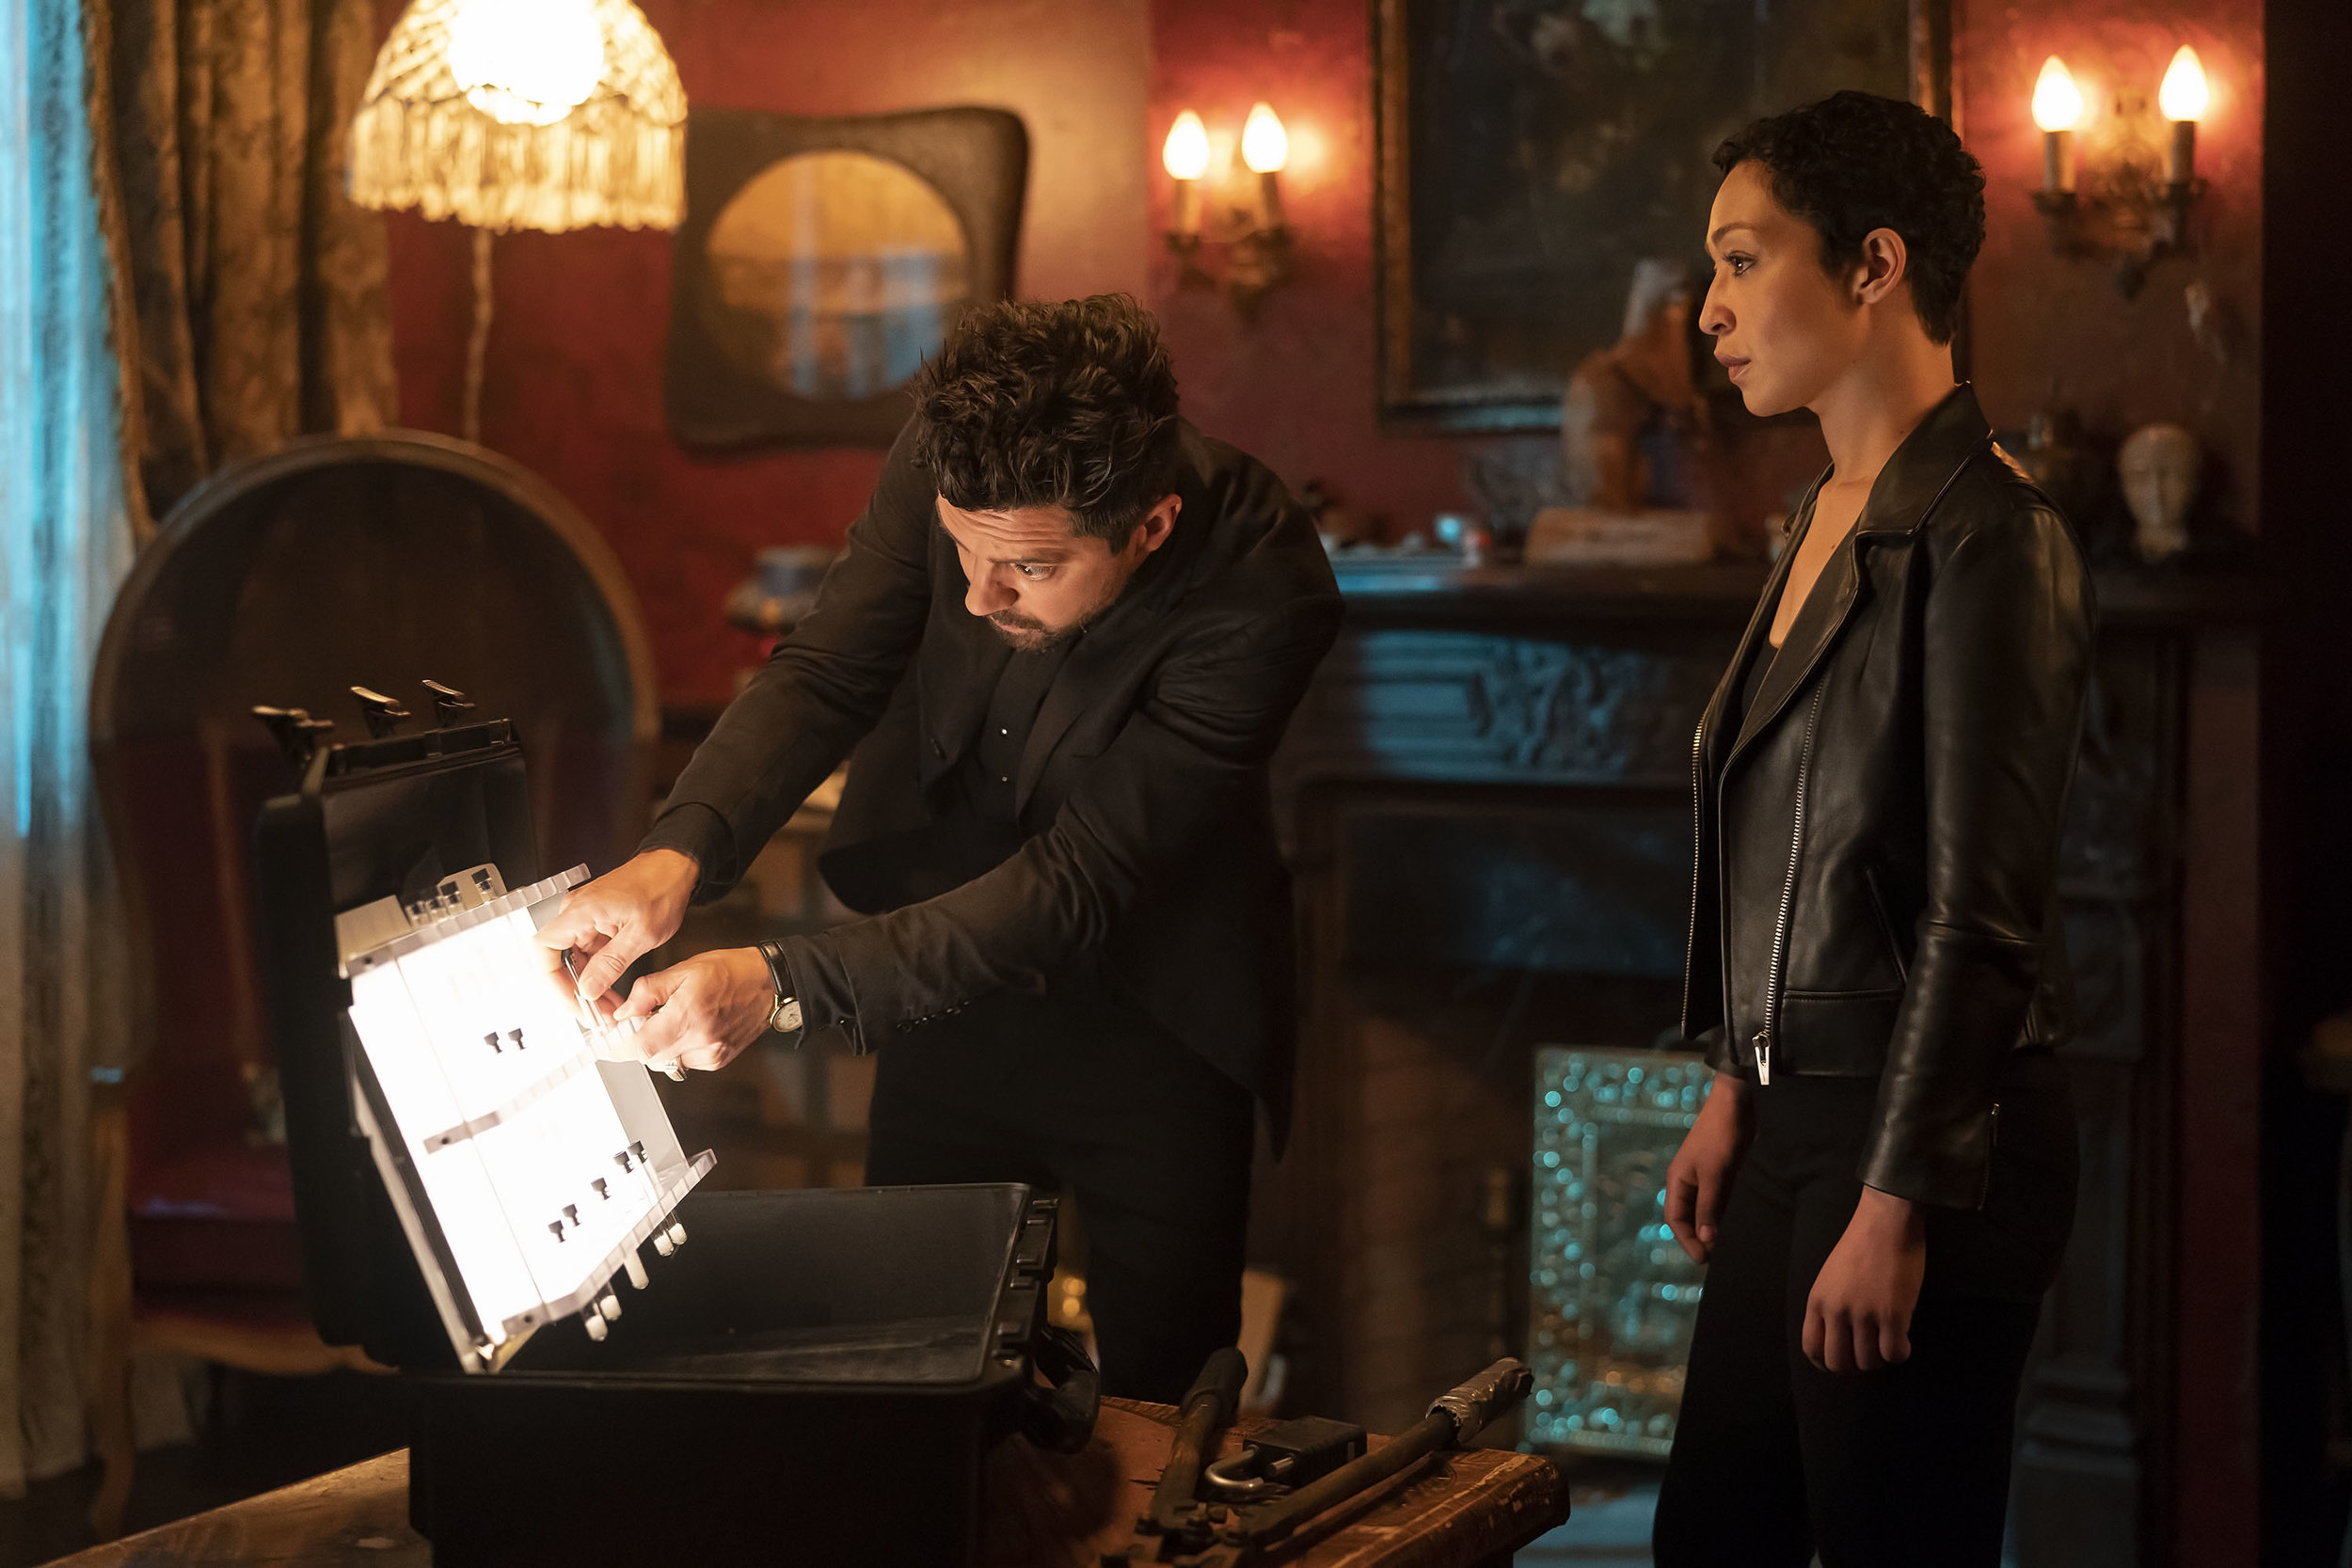 Dominic Cooper as Jesse Custer, Ruth Negga as Tulip O'Hare